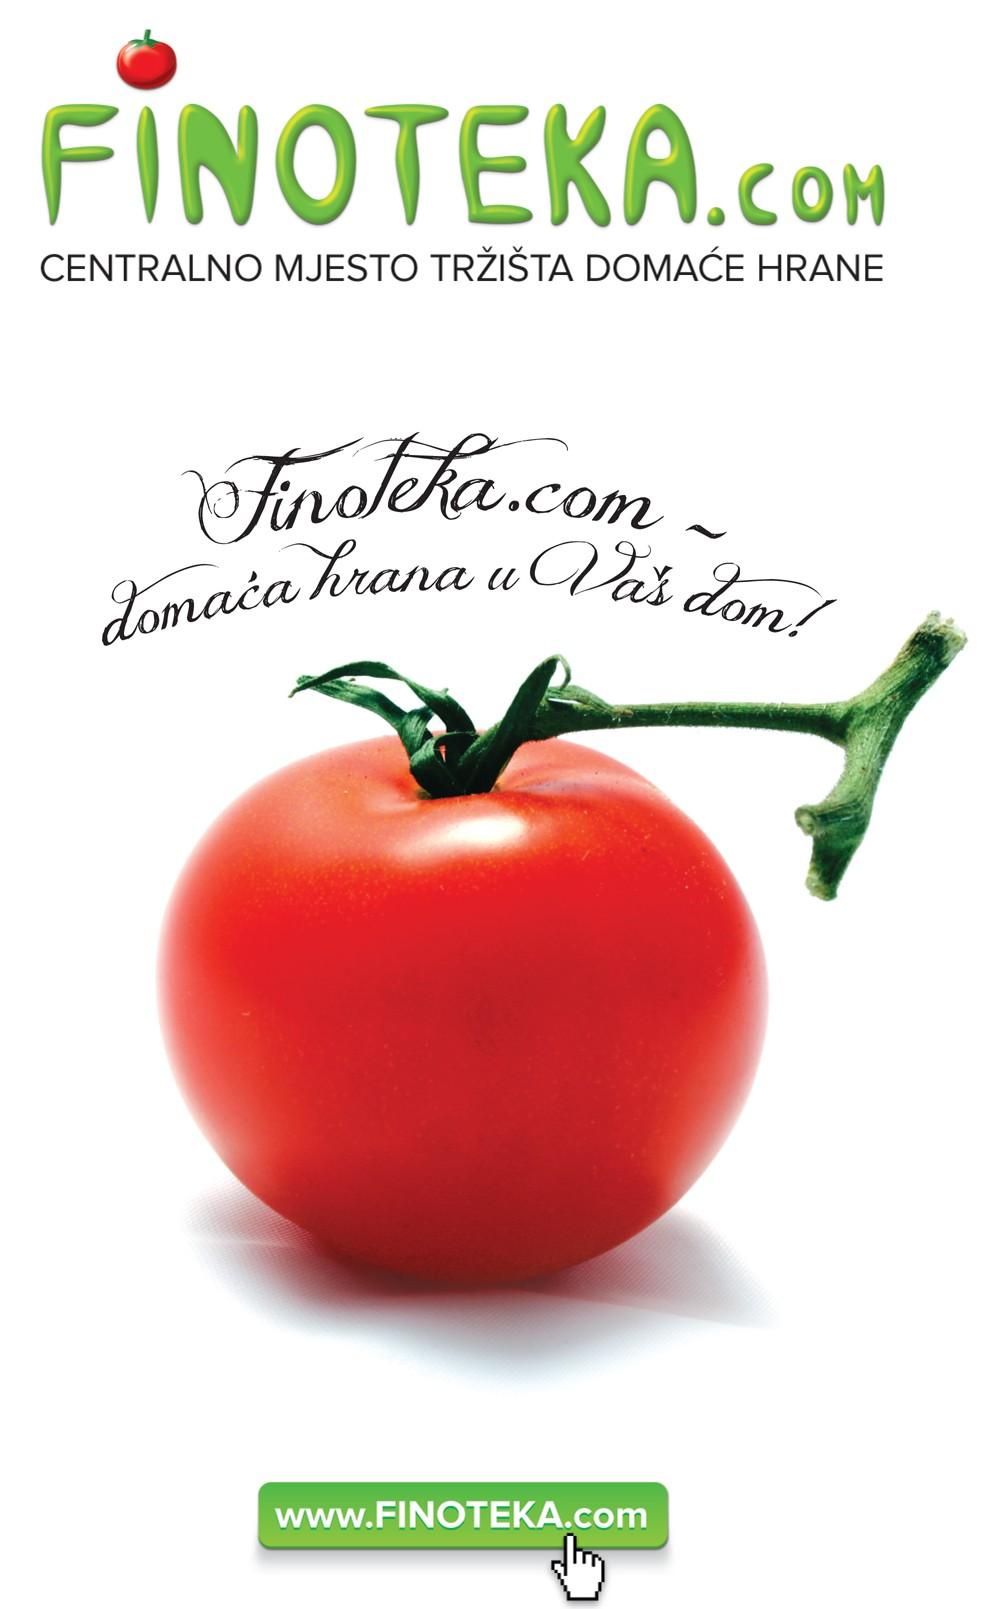 finoteka.com